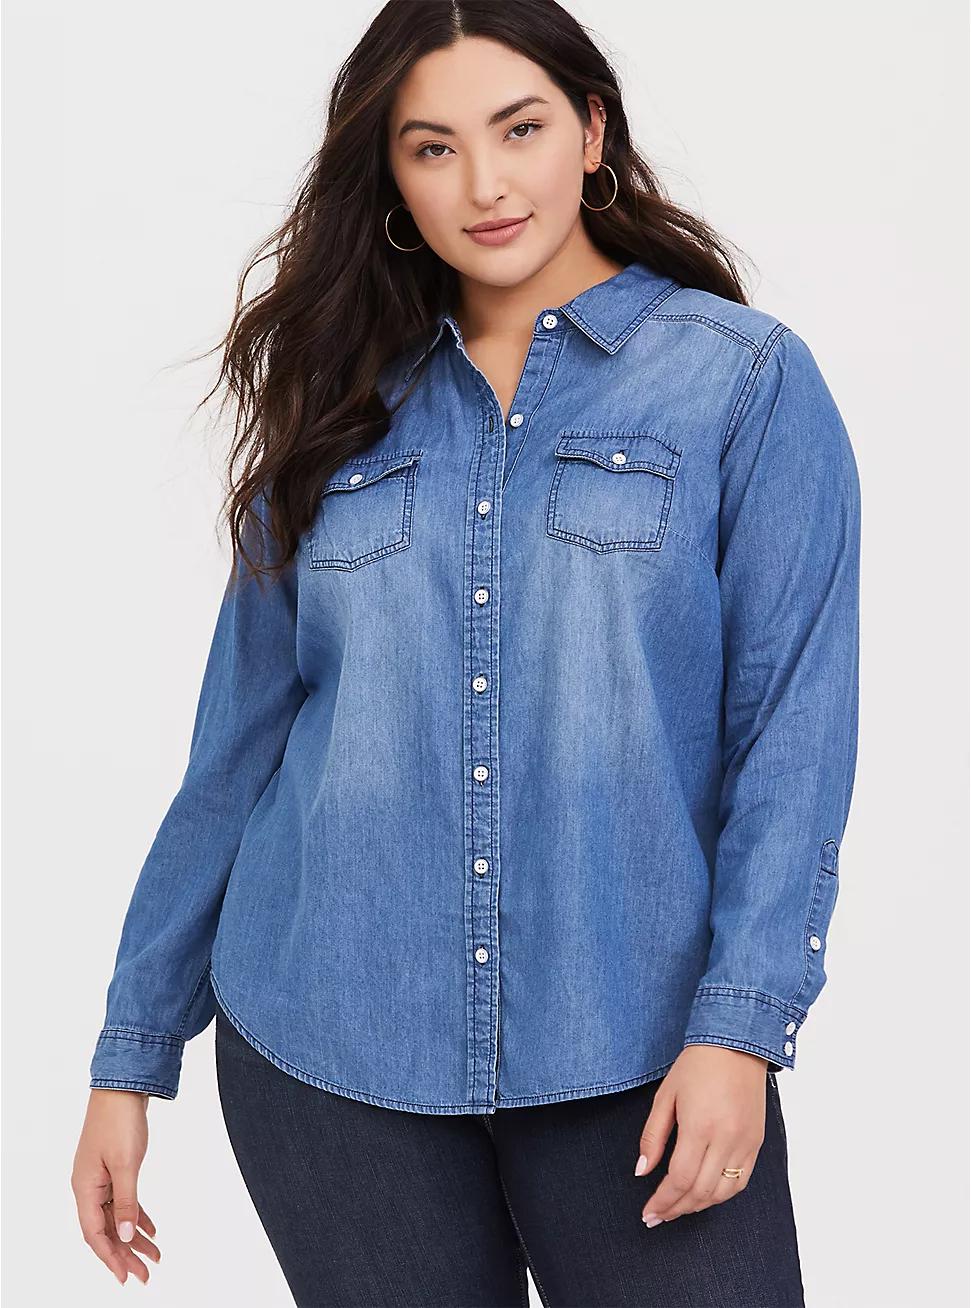 denim jean button down shirt blouse womens medium